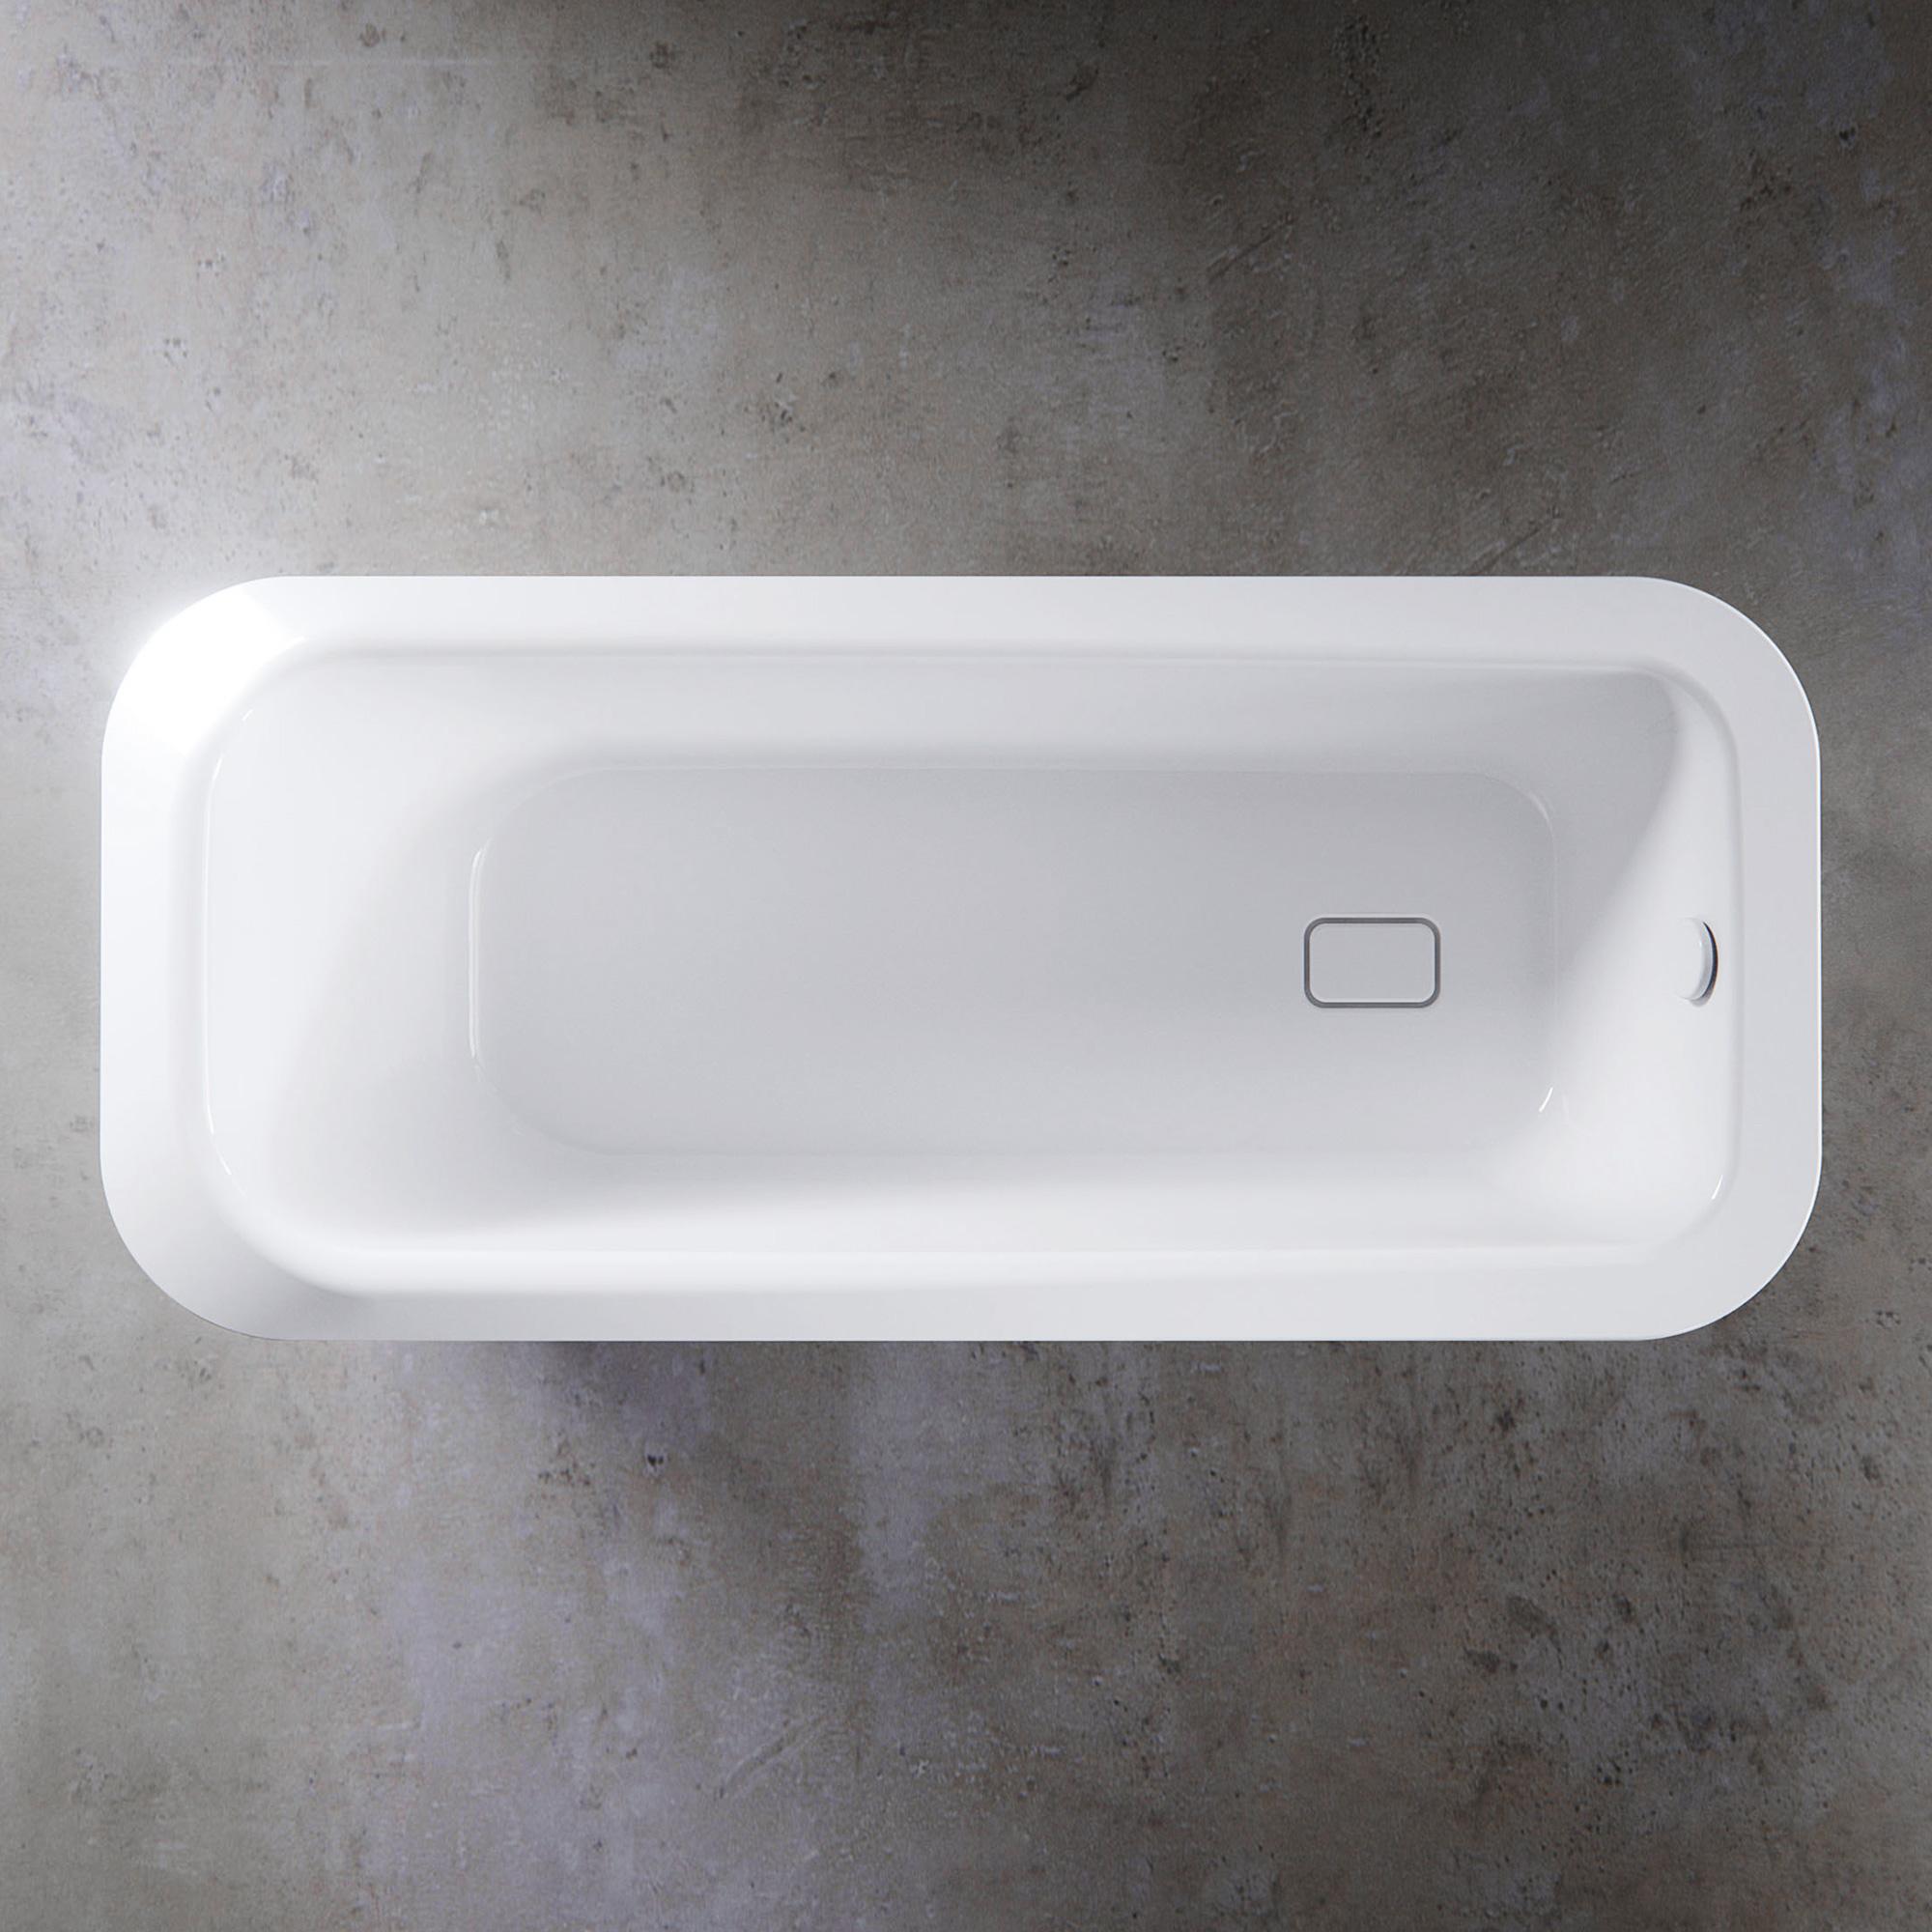 kaldewei meisterst ck emerso freistehende badewanne l 180. Black Bedroom Furniture Sets. Home Design Ideas